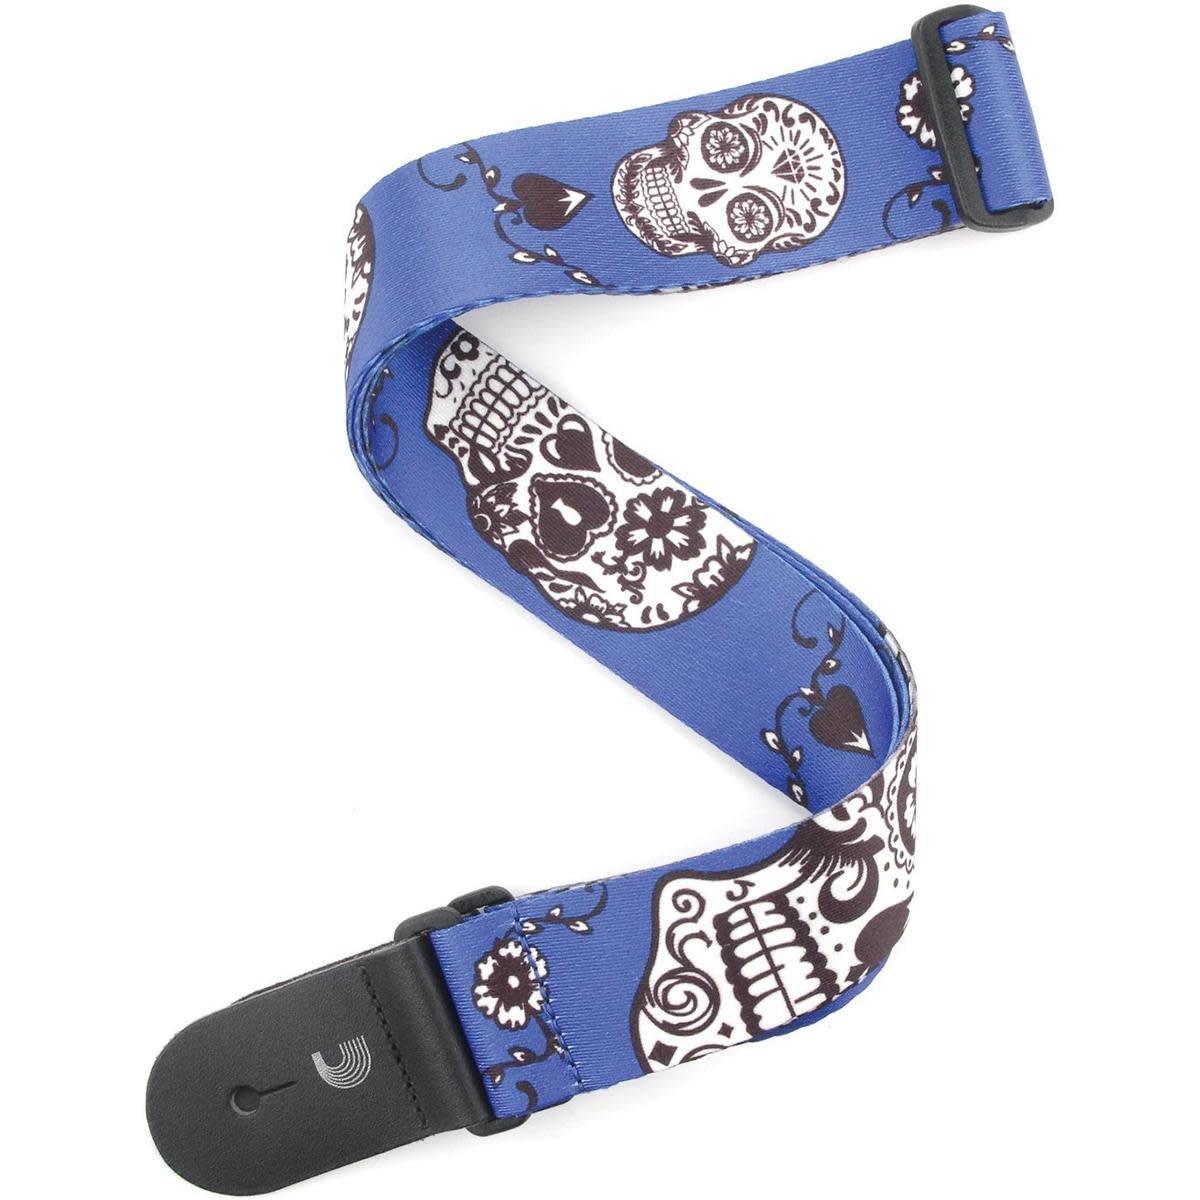 2 Woven Guitar Strap, Sugar Skulls - Blue, by D'Addario